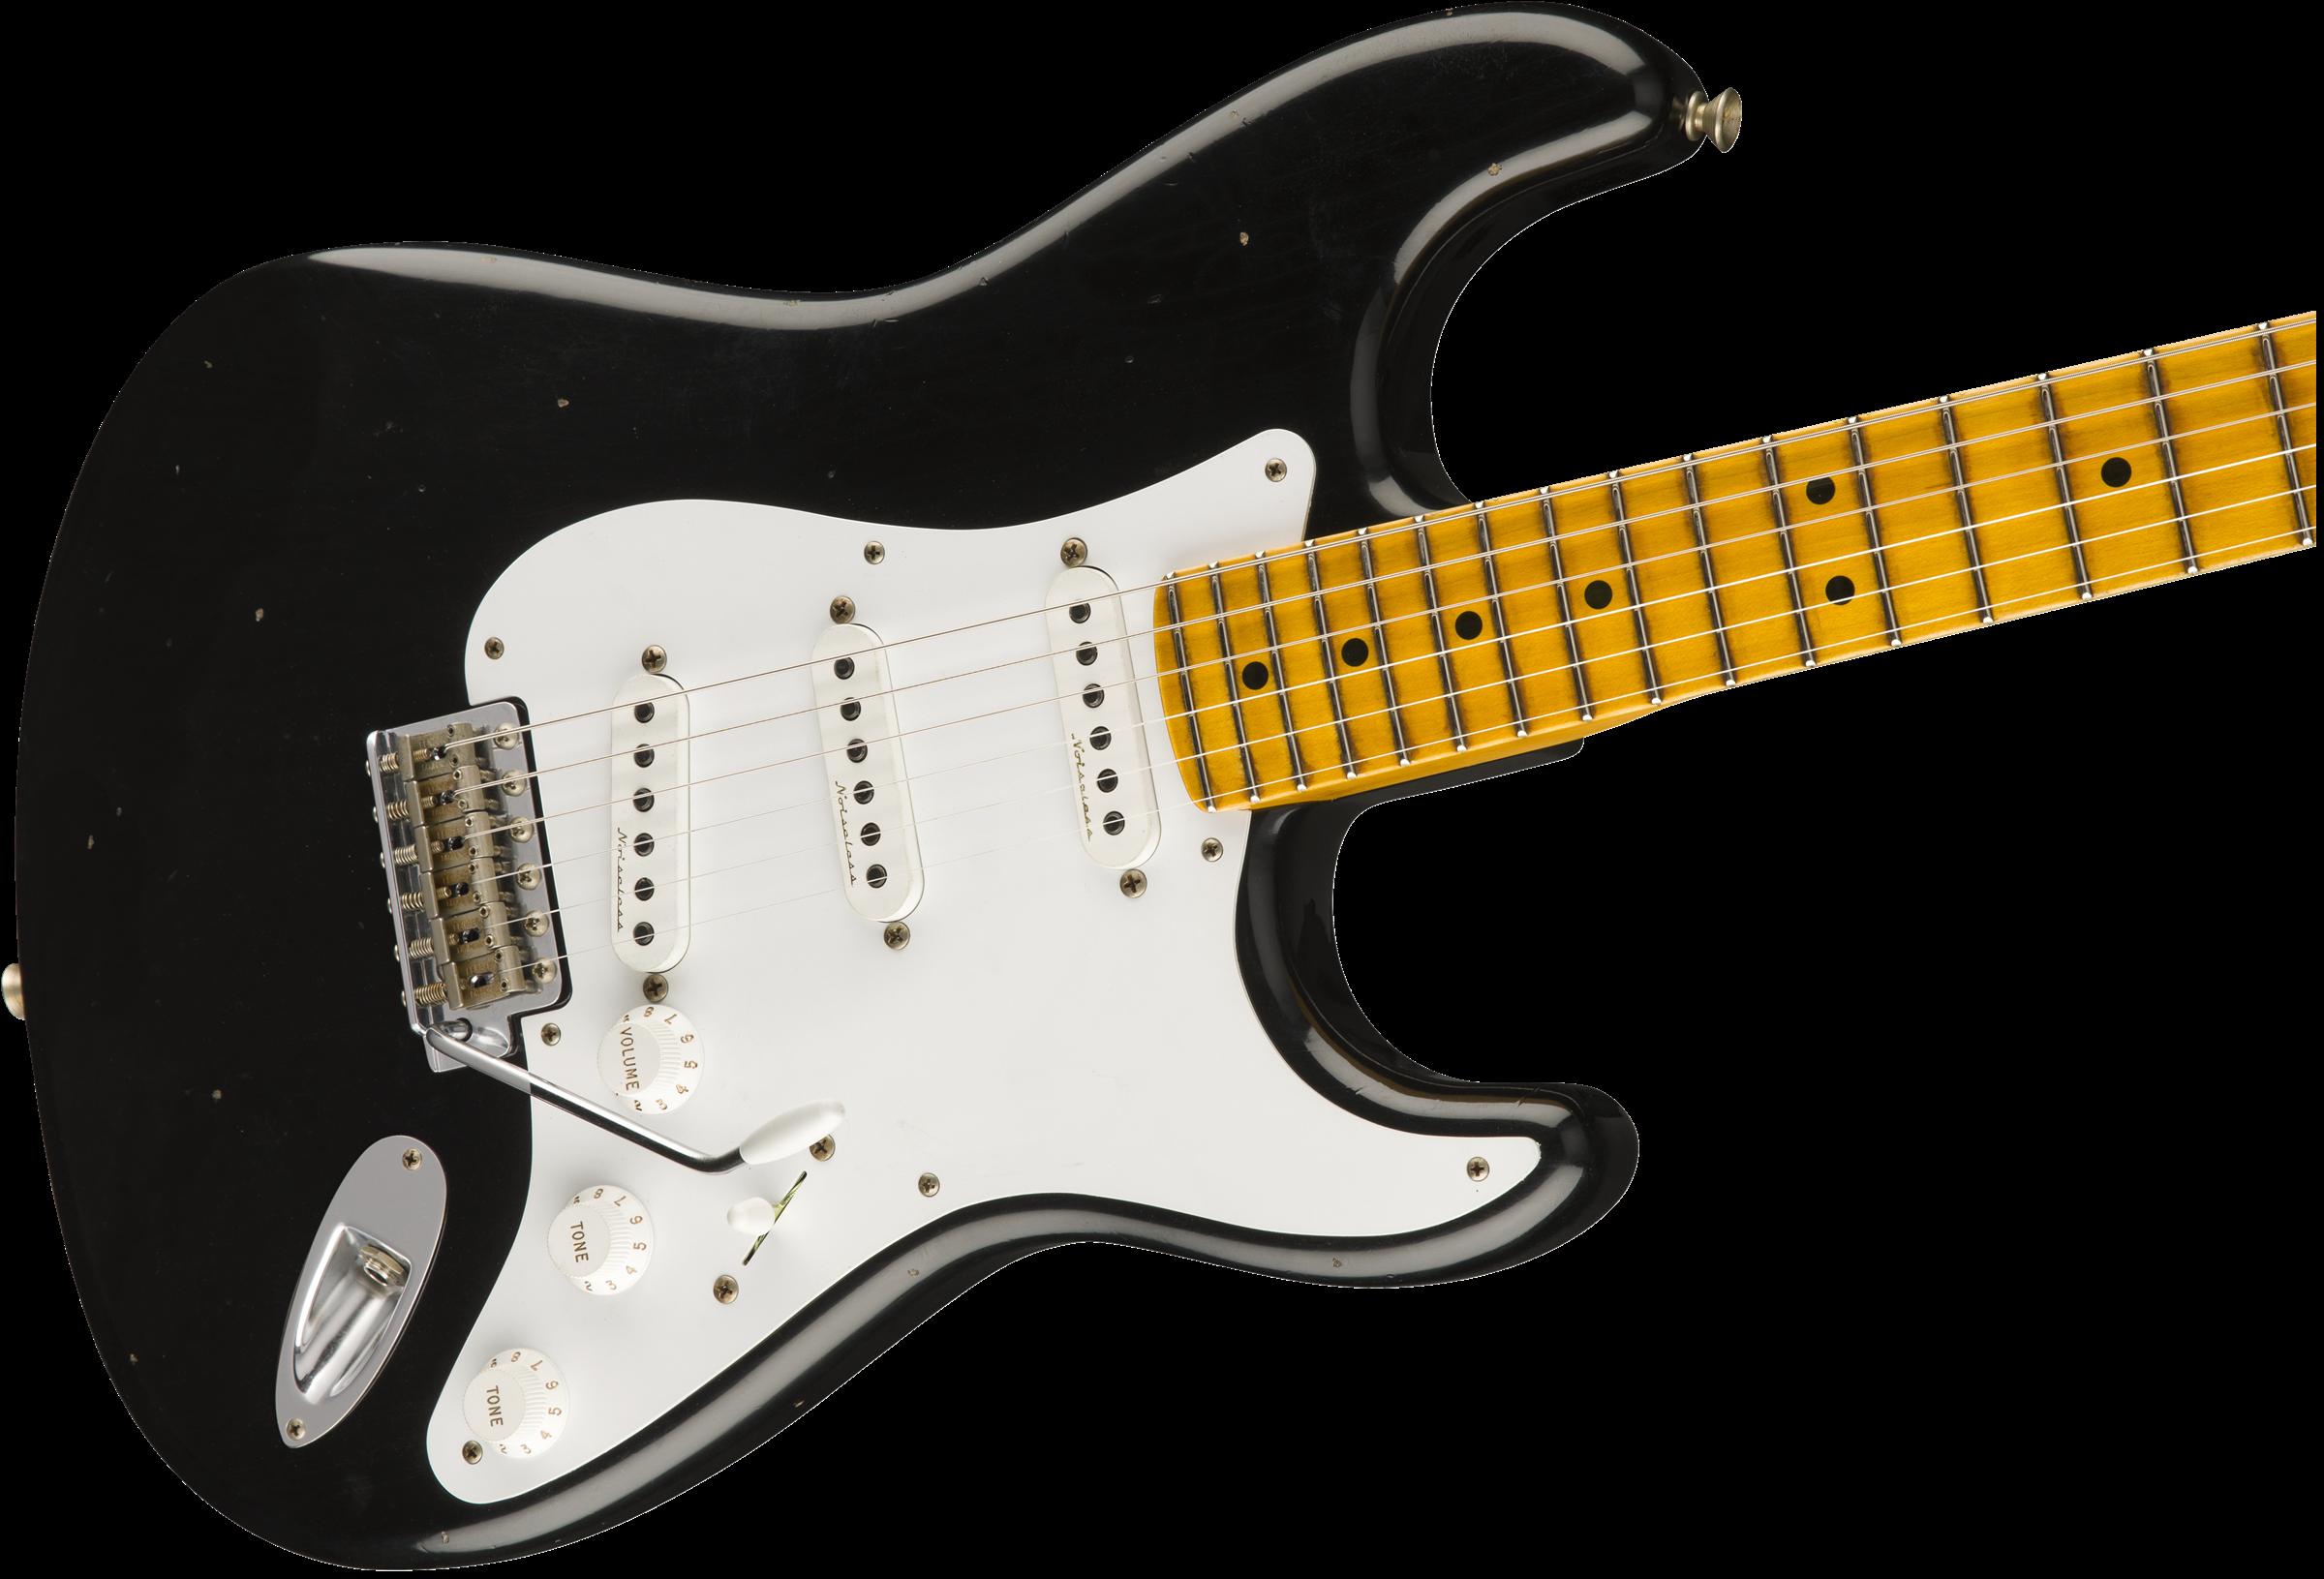 Fender eric clapton stratocaster electric guitar soft v maple neck.